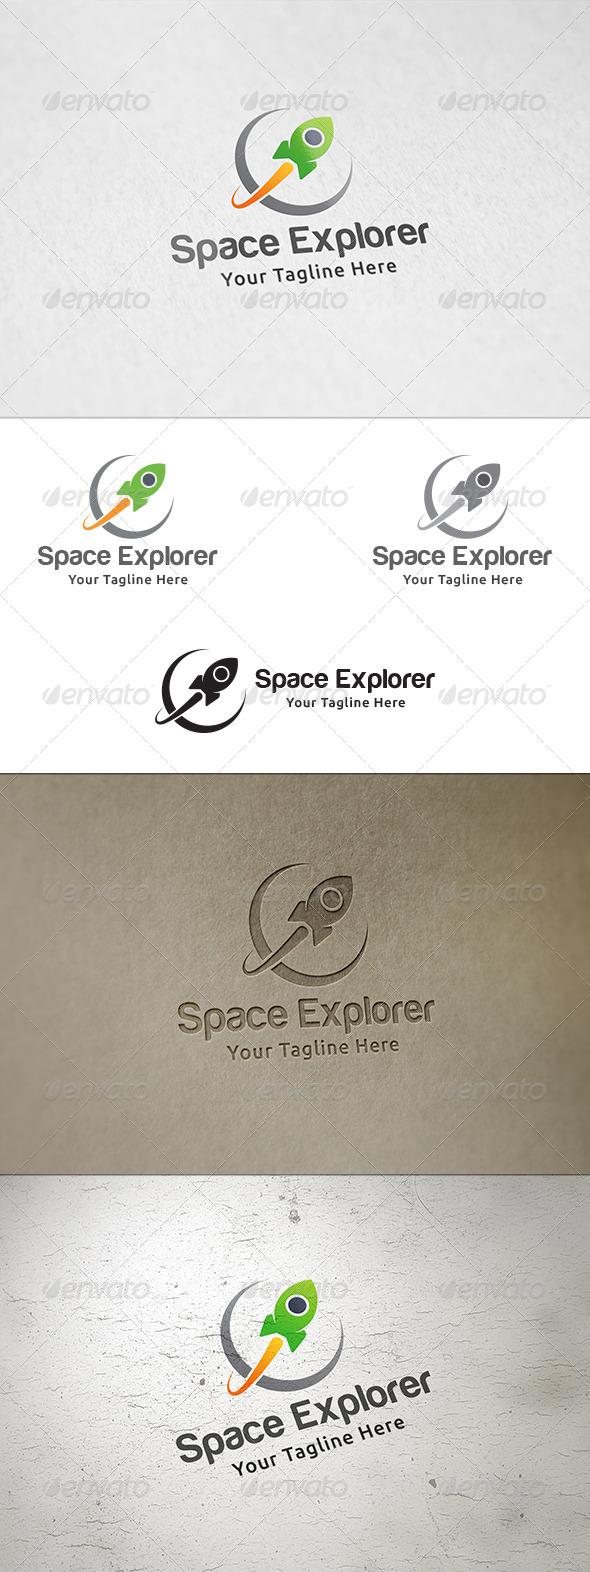 GraphicRiver Space Explorer Logo Template 8597377